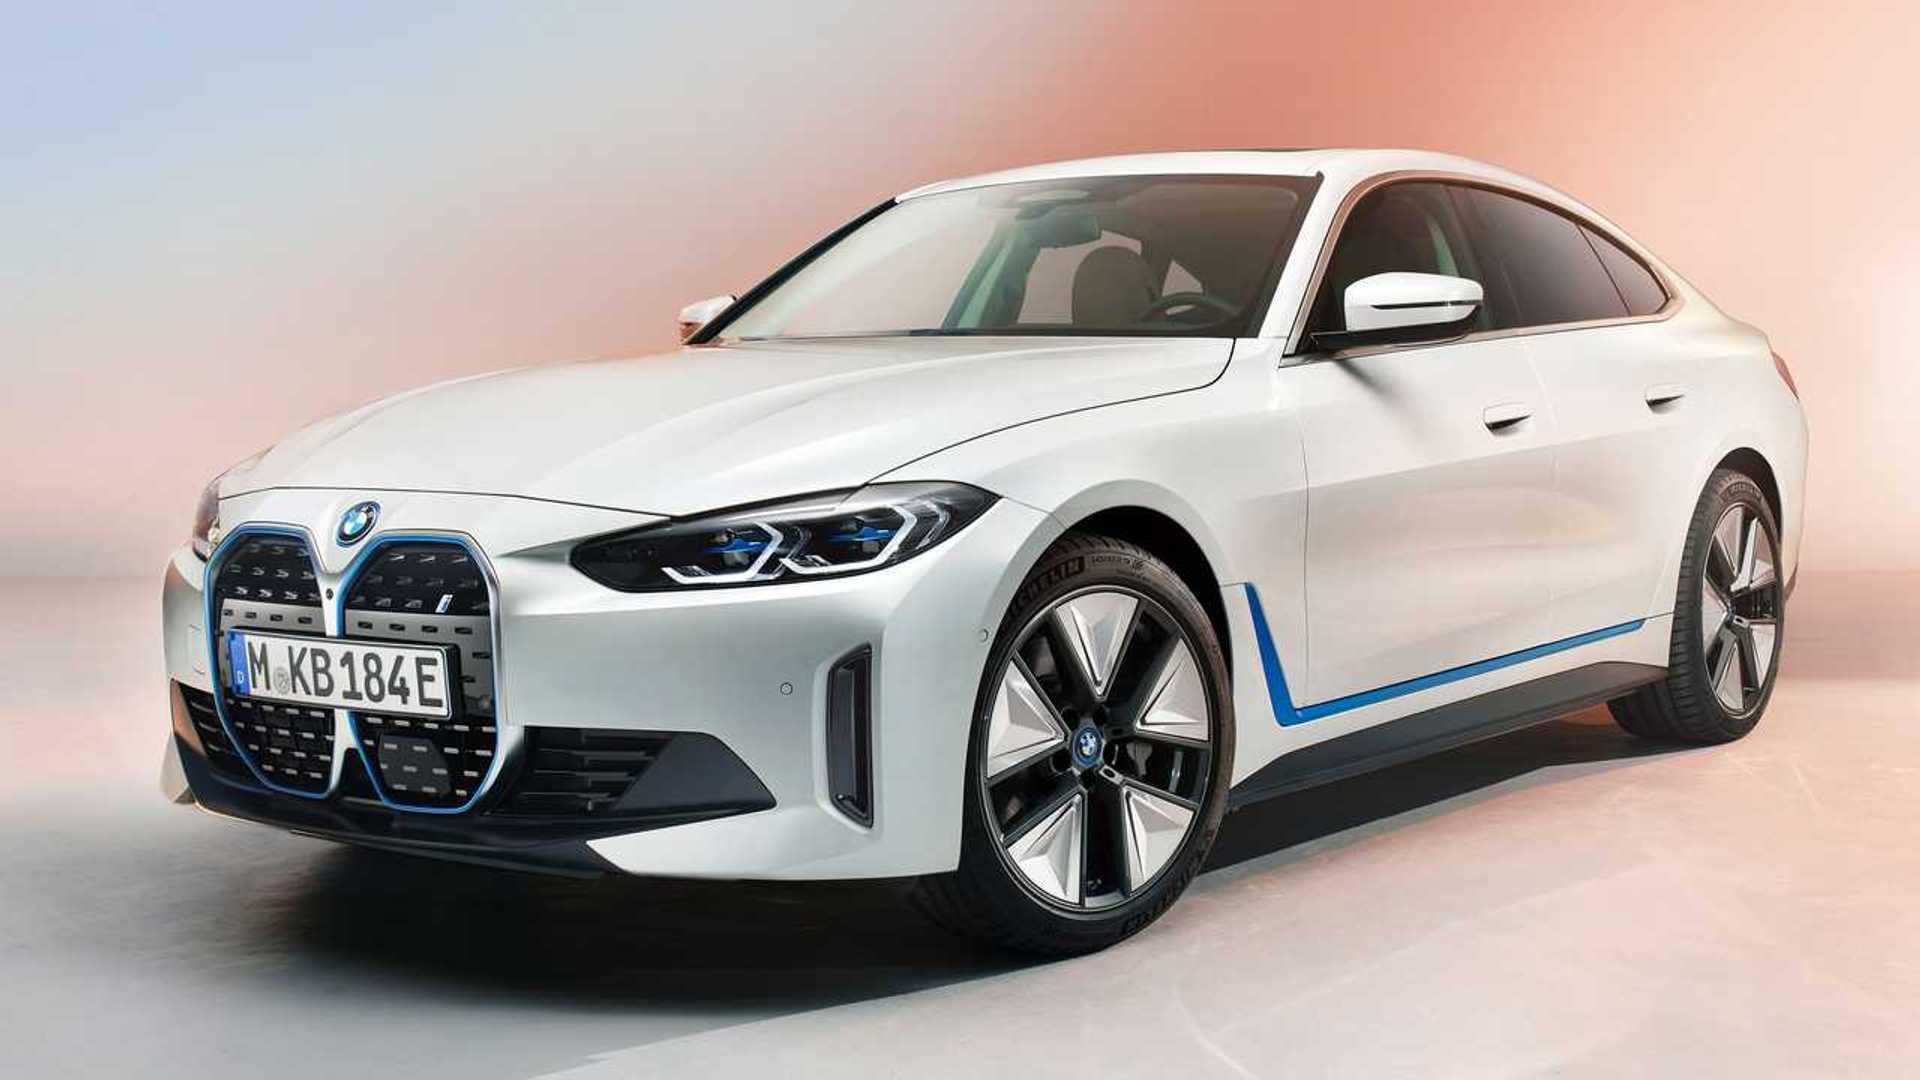 2022 BMW i4 Revealed With 523 Horsepower And 300 Miles Of Range